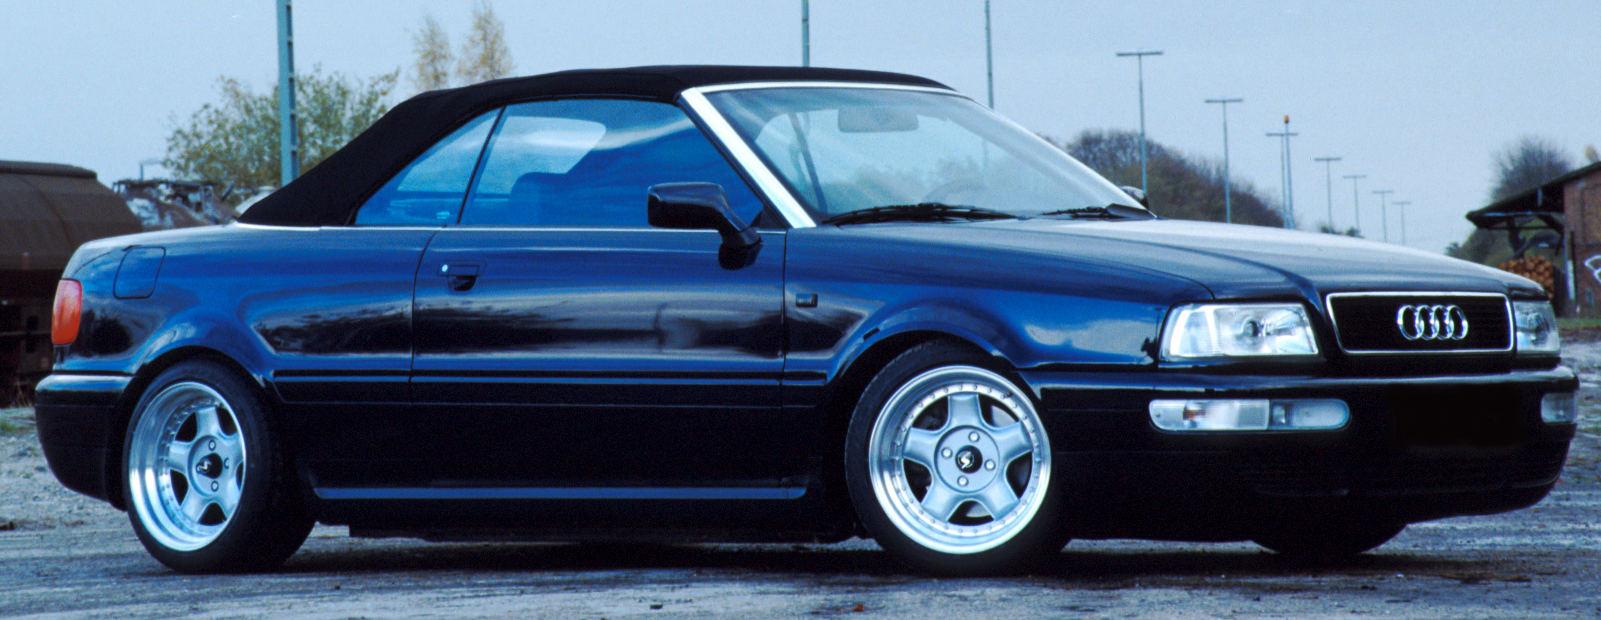 Audi Cabrio side